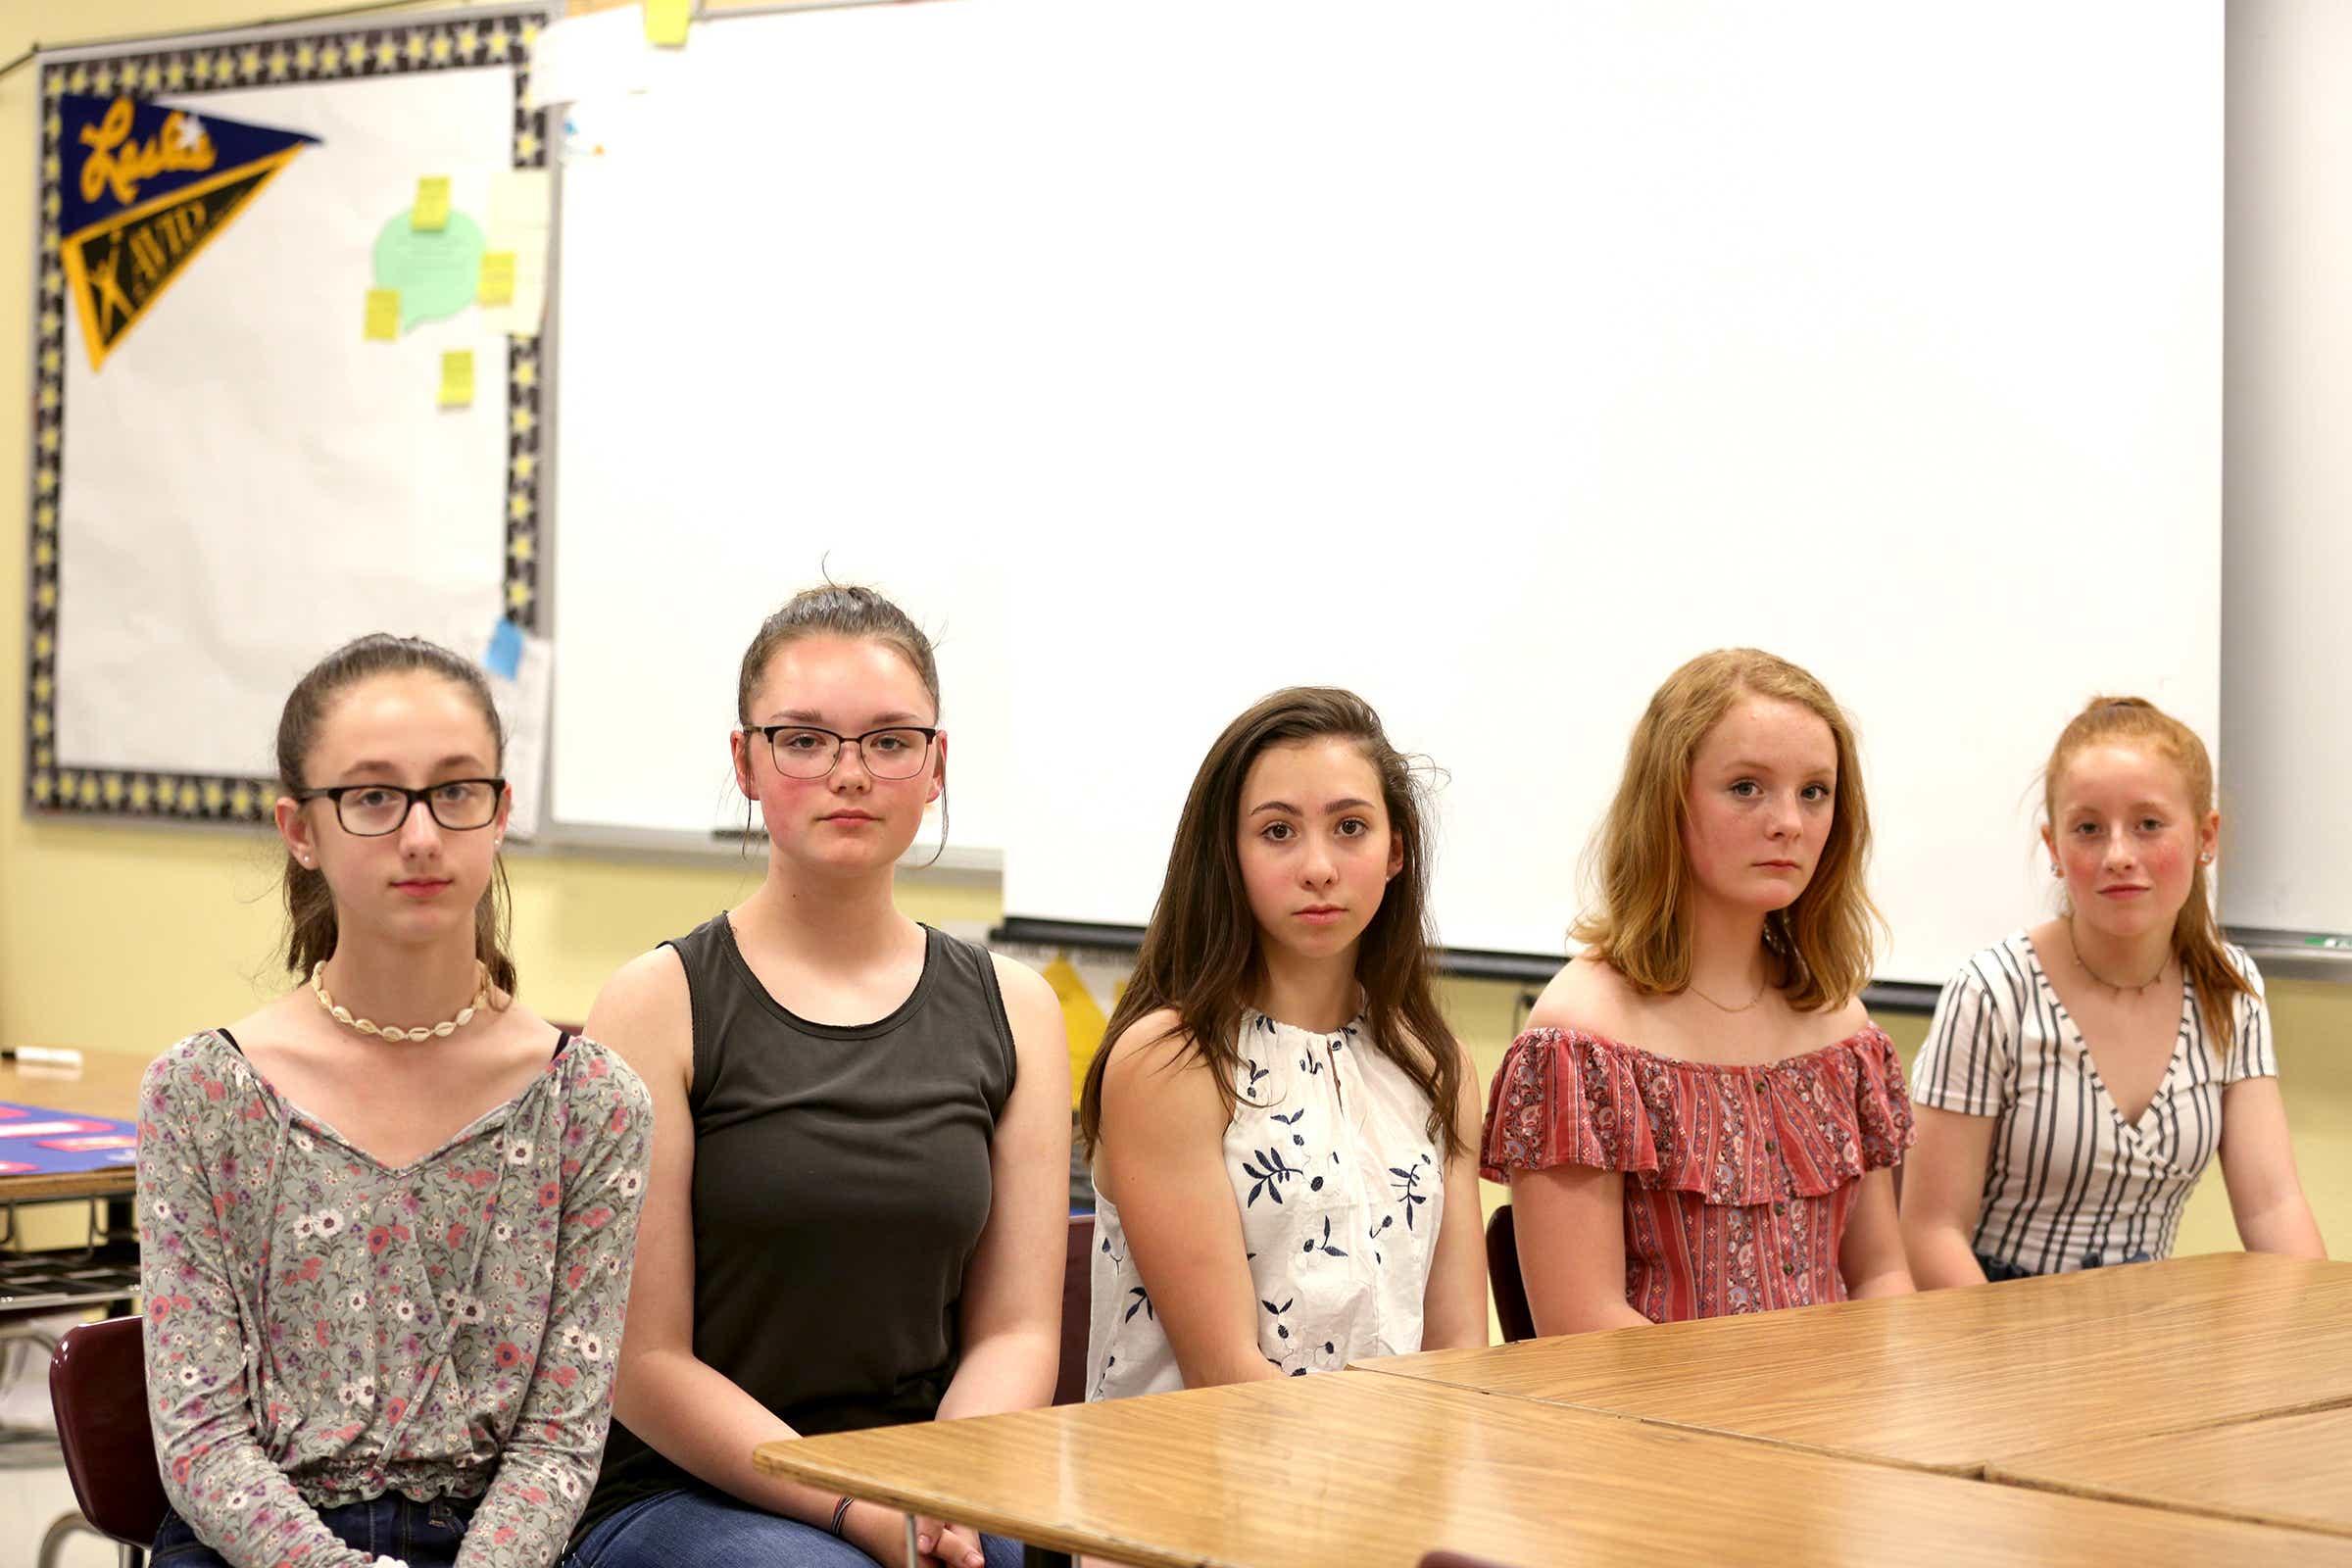 38f3b2f1b1 Students, parents challenge Salem-Keizer schools' dress code policy